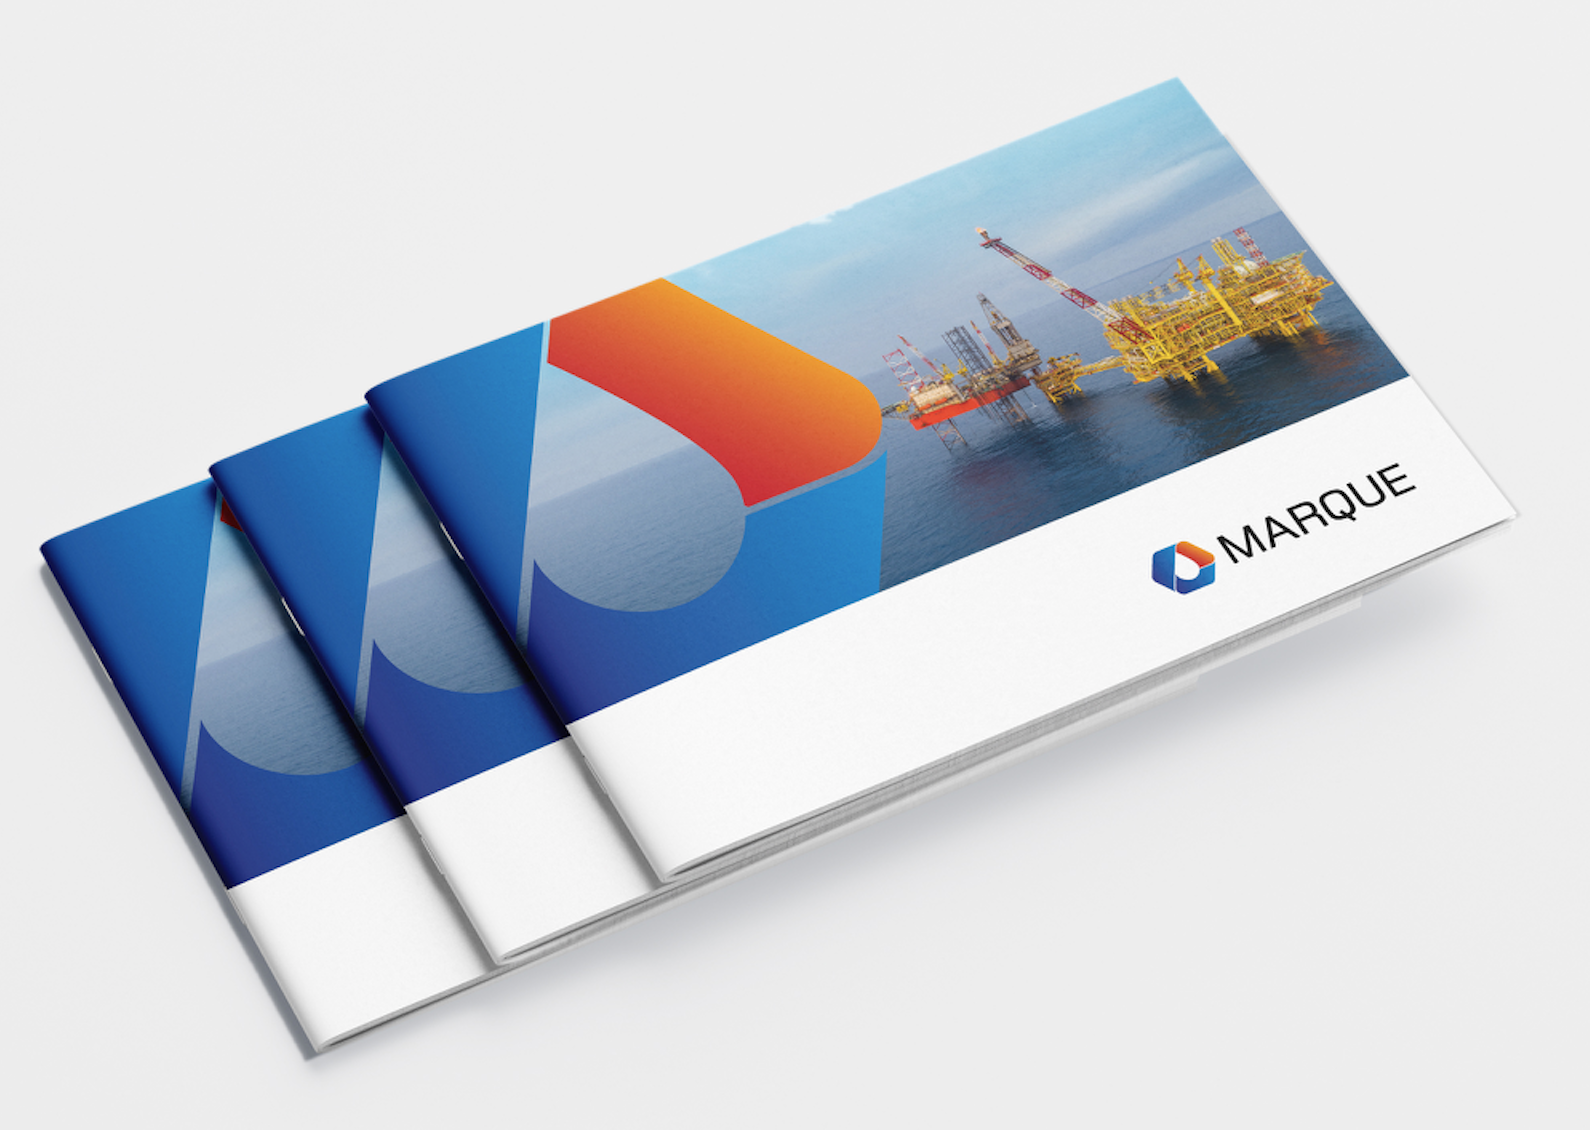 Marque Oil & Gas